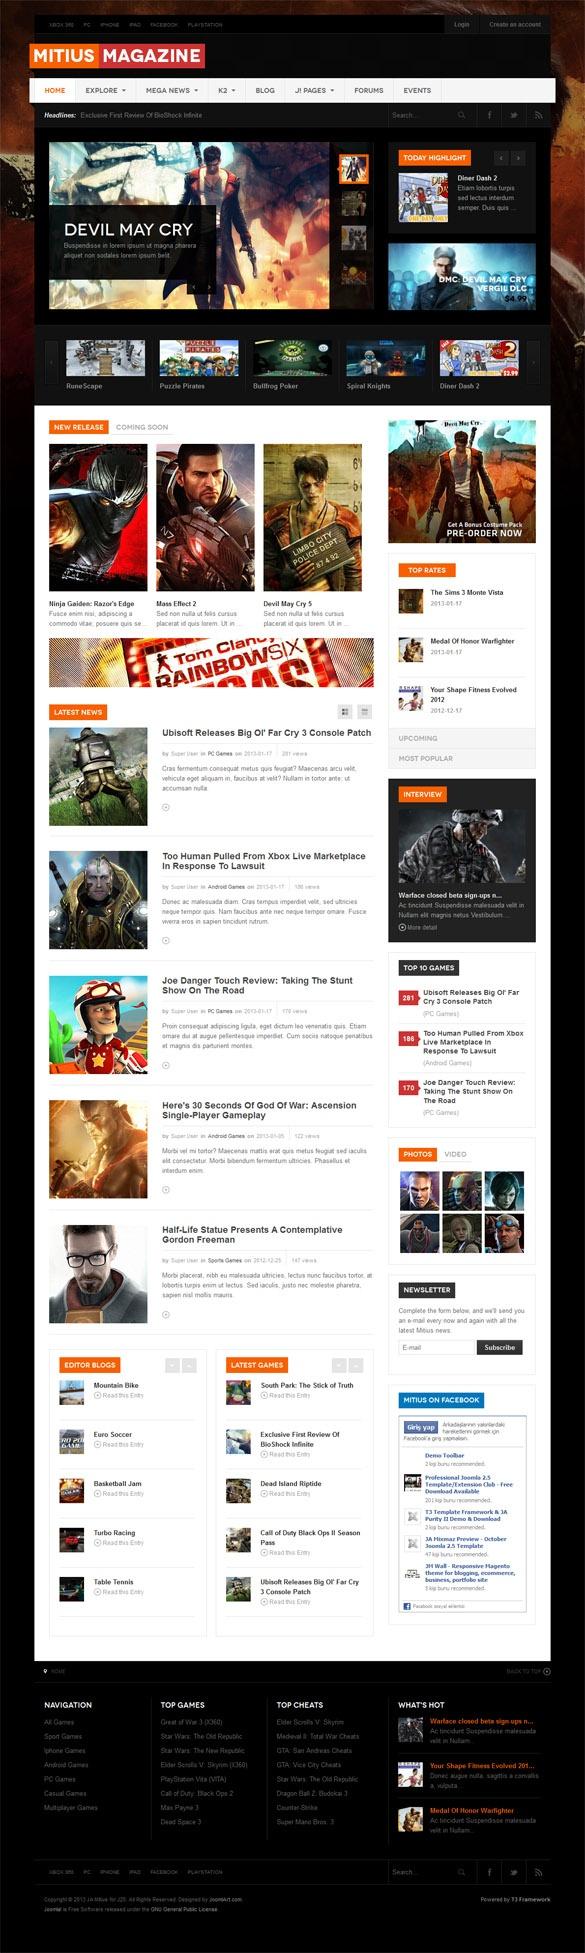 JA Mitius, Joomla Magazine News Portal Template